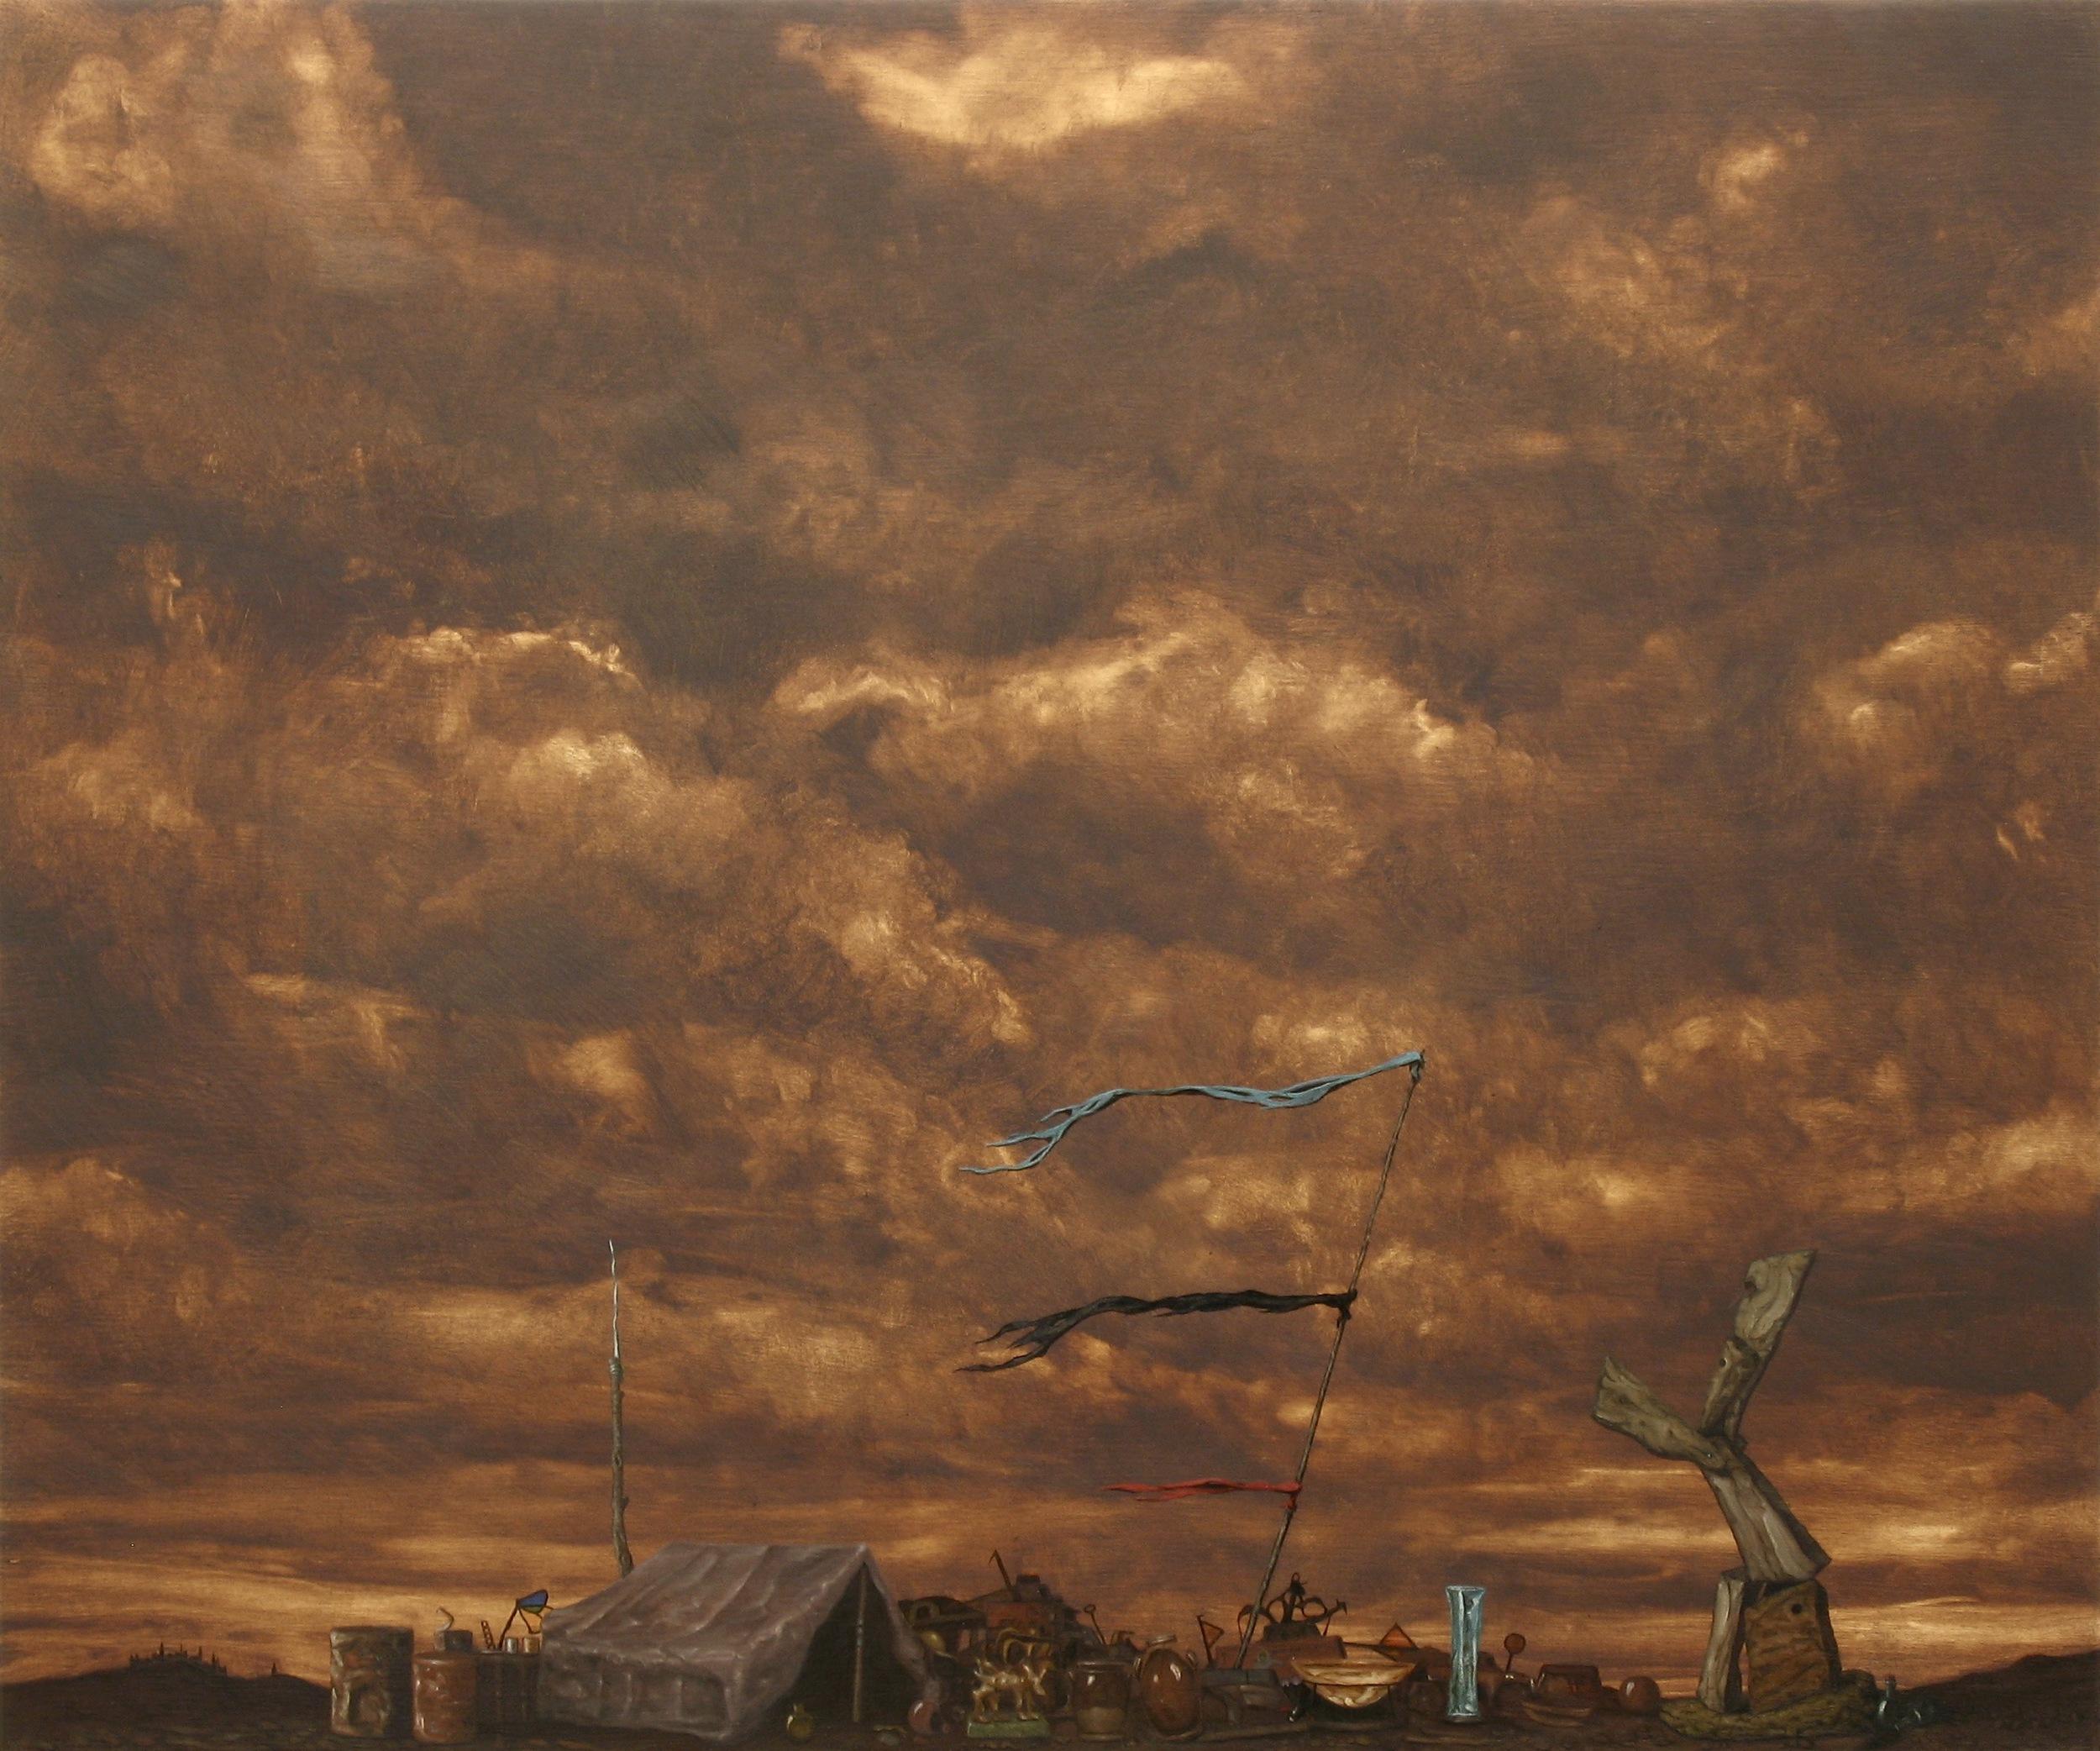 Tempestas, Oil on wood panel, 60x50cm, 2010